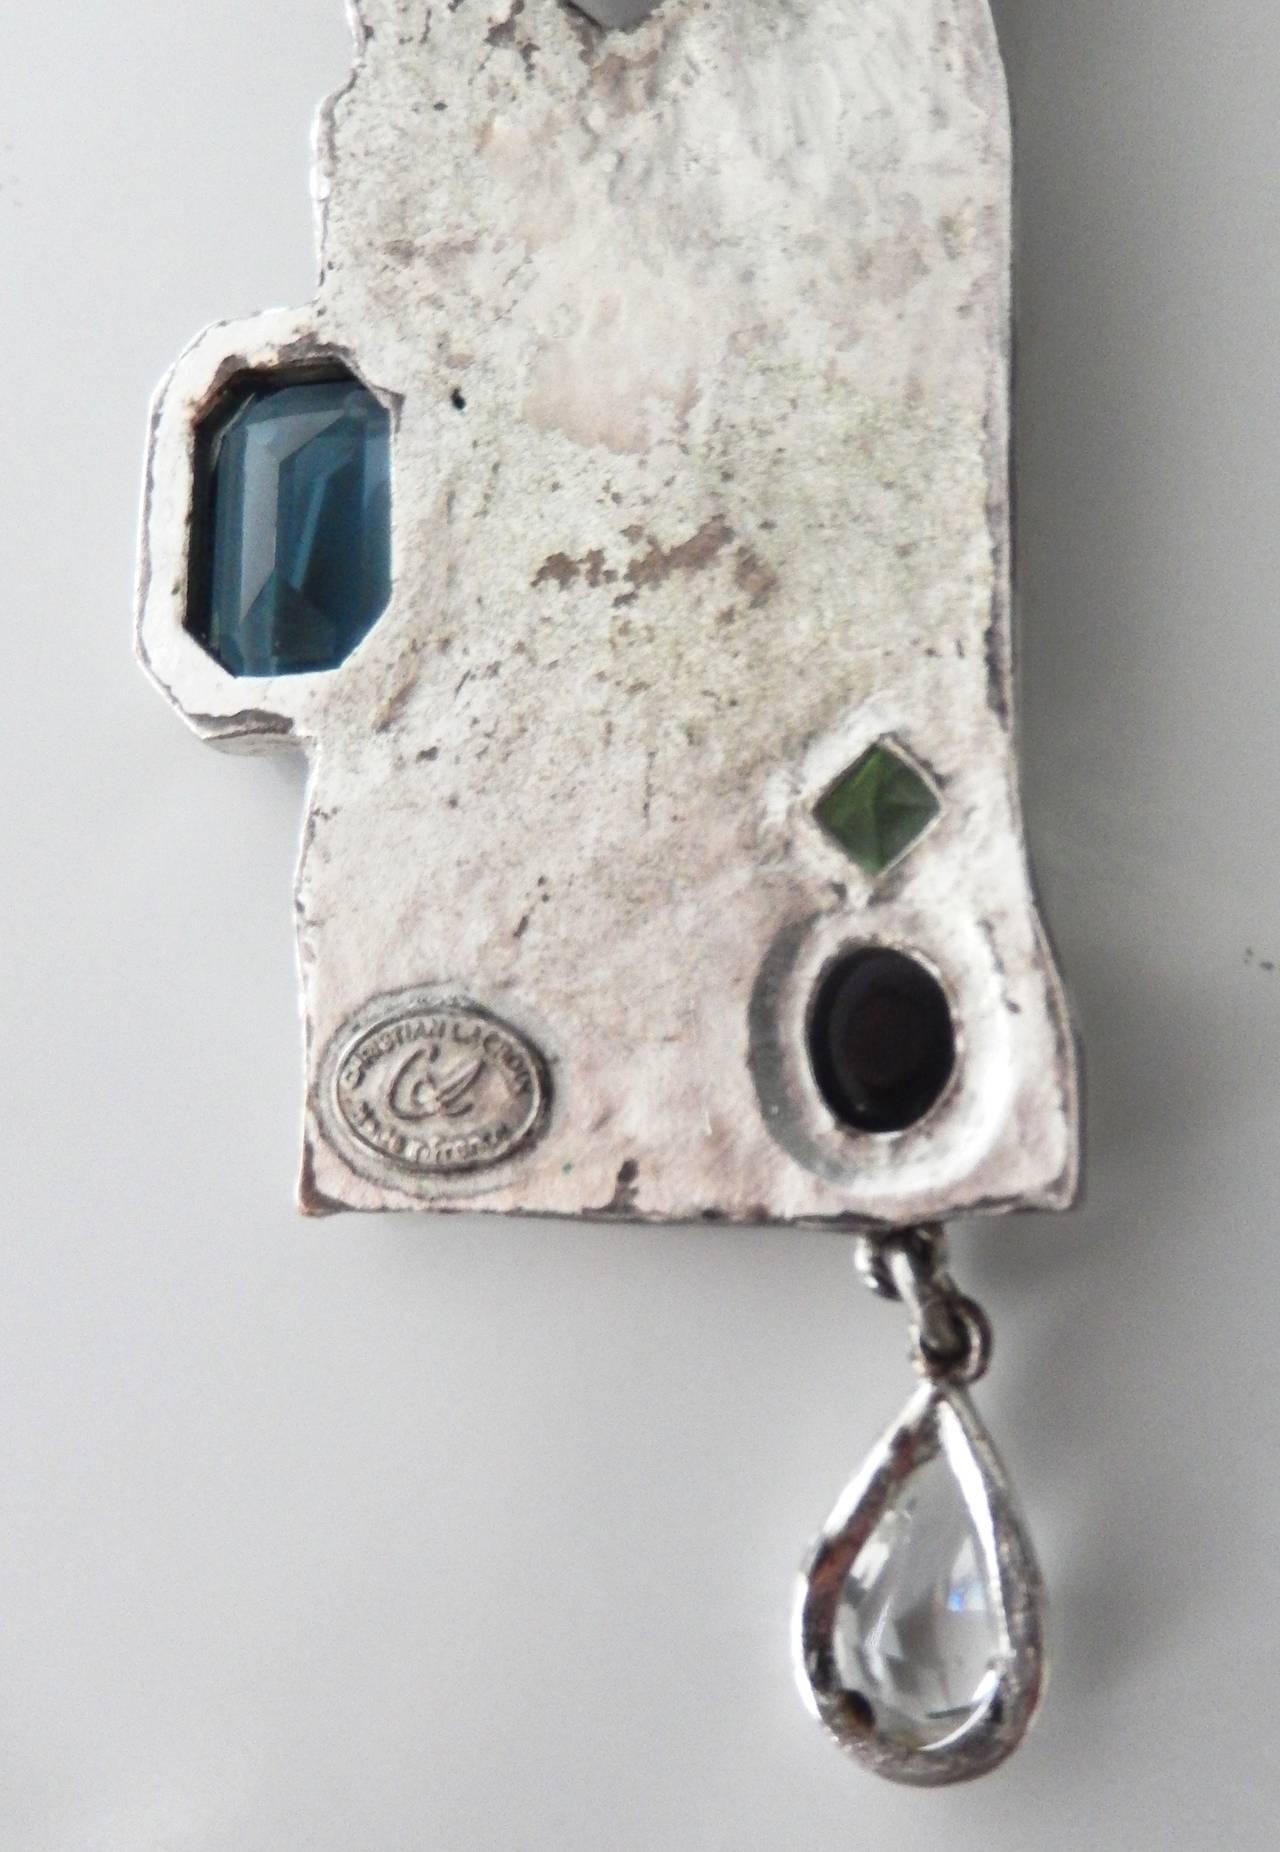 1990s Lacroix Modern Tribalist Necklace For Sale 4